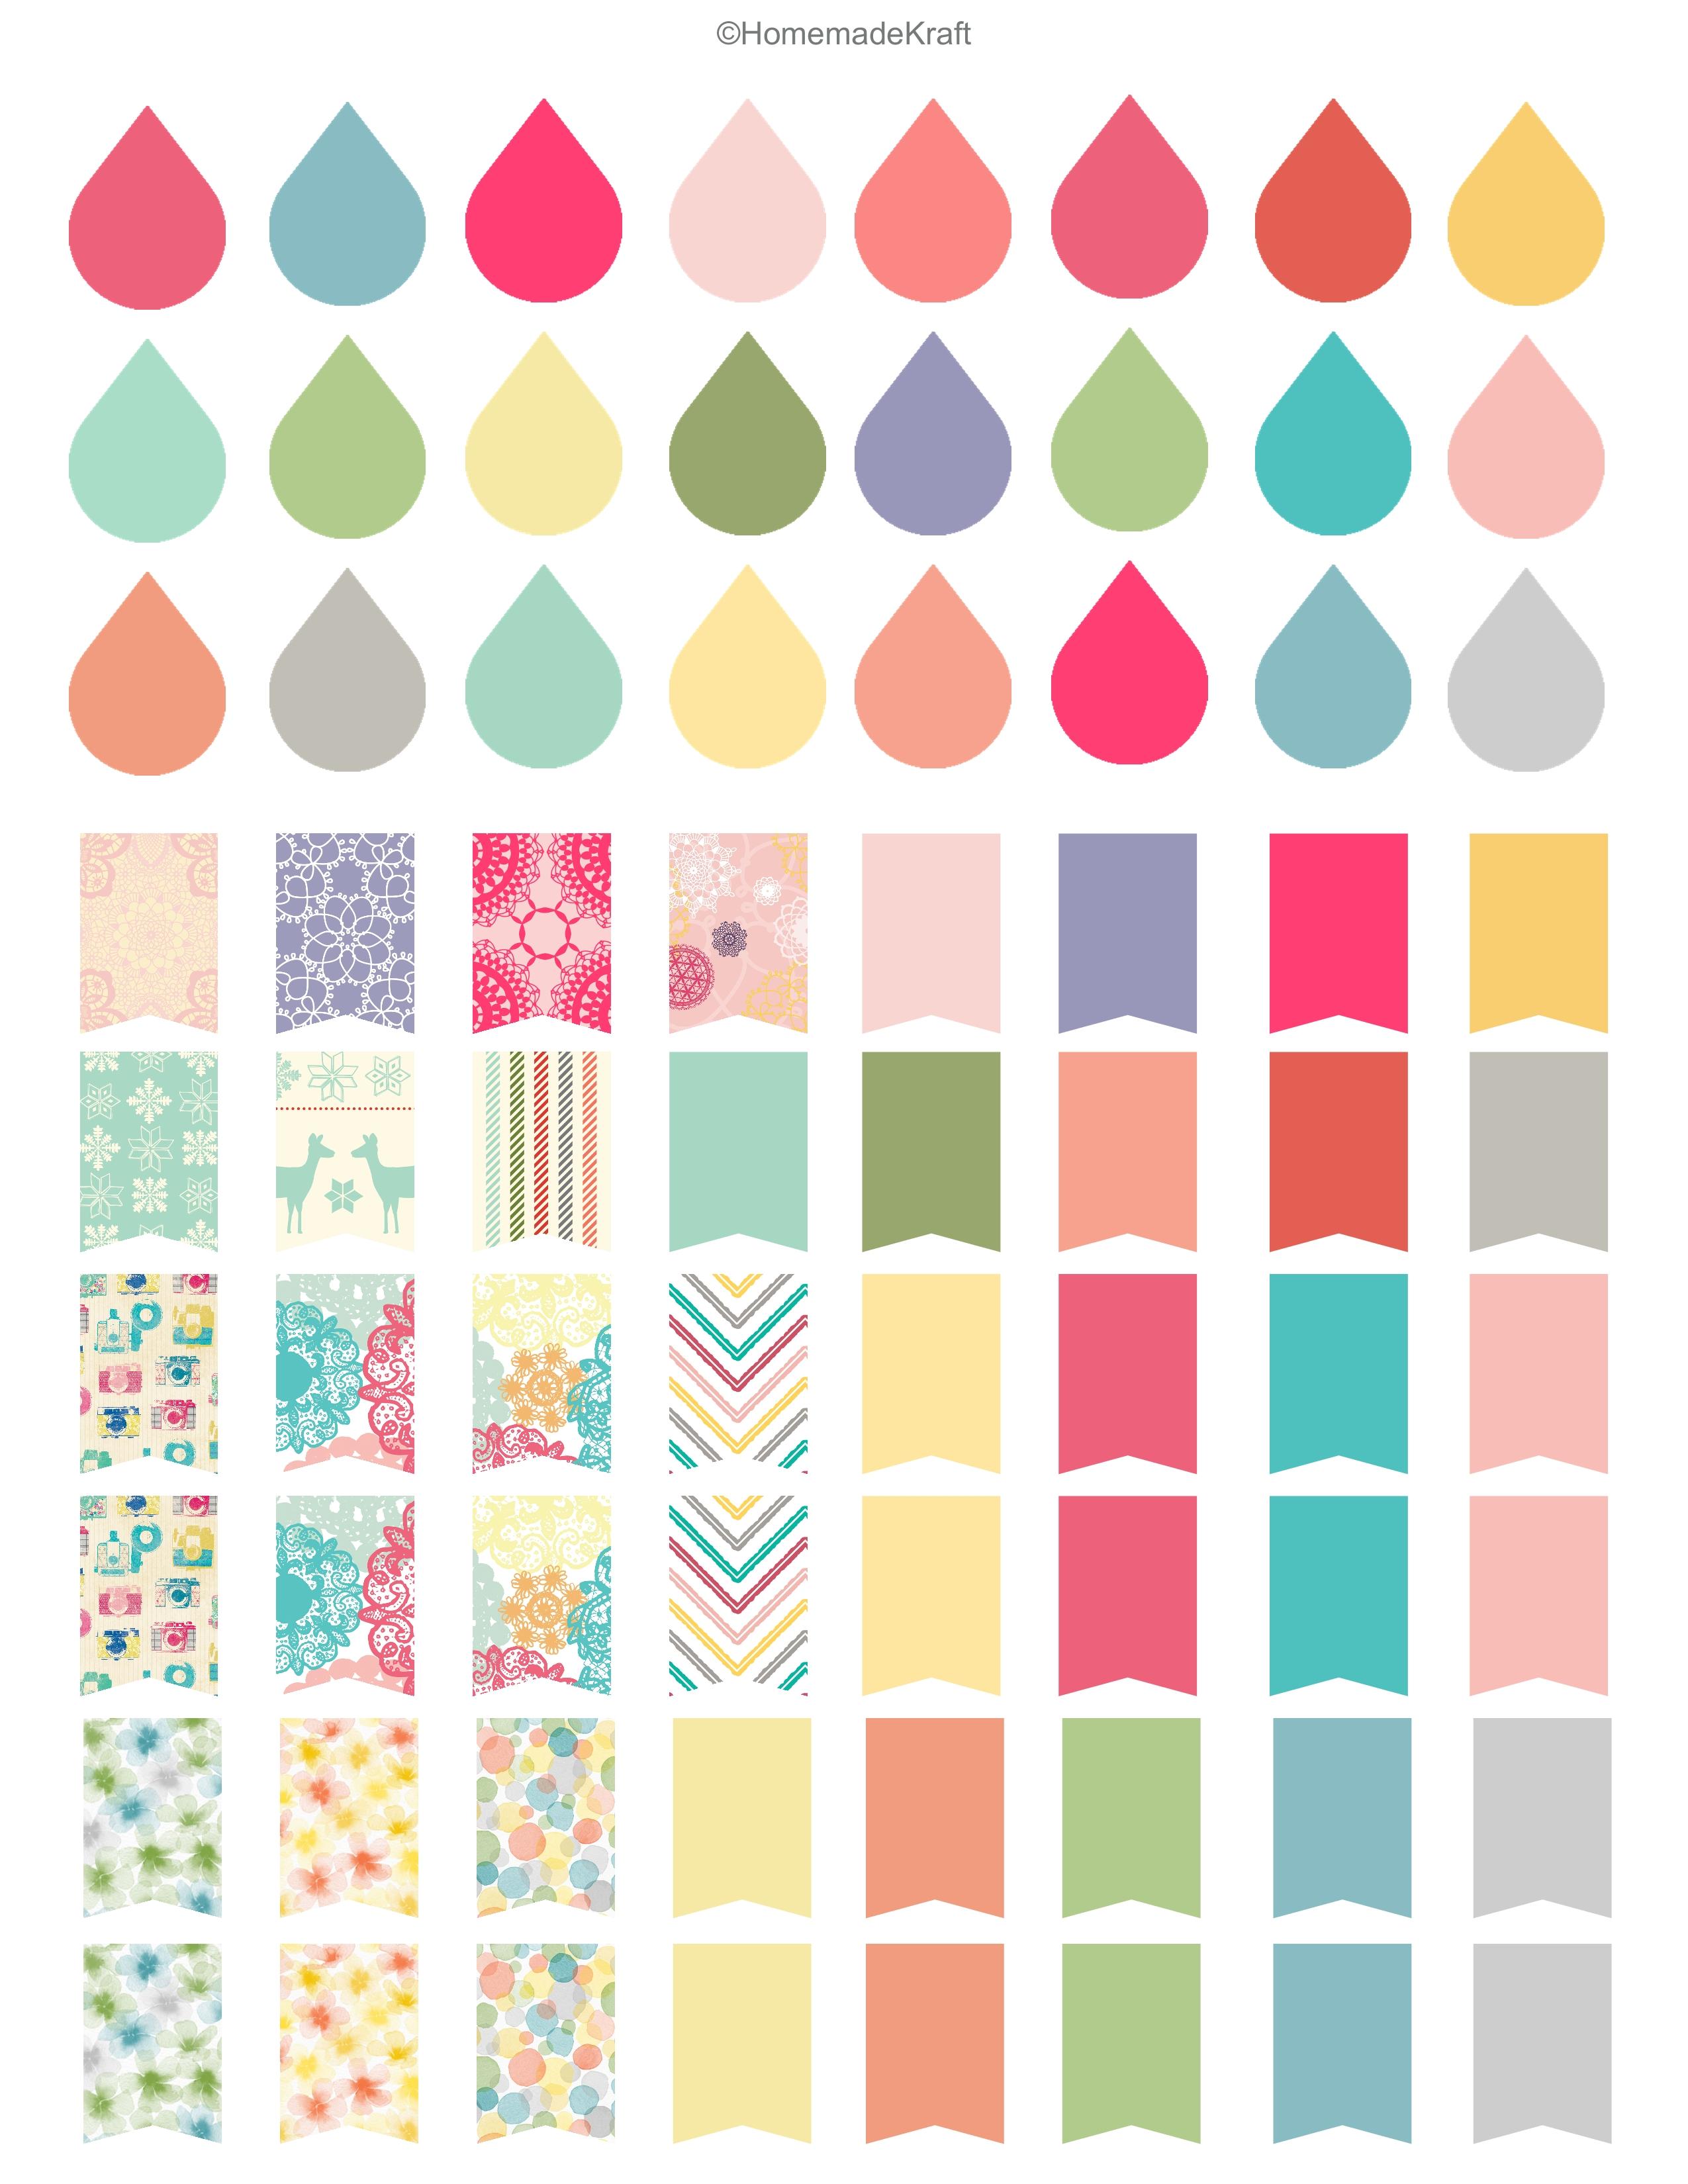 Printable Sticker Sheets